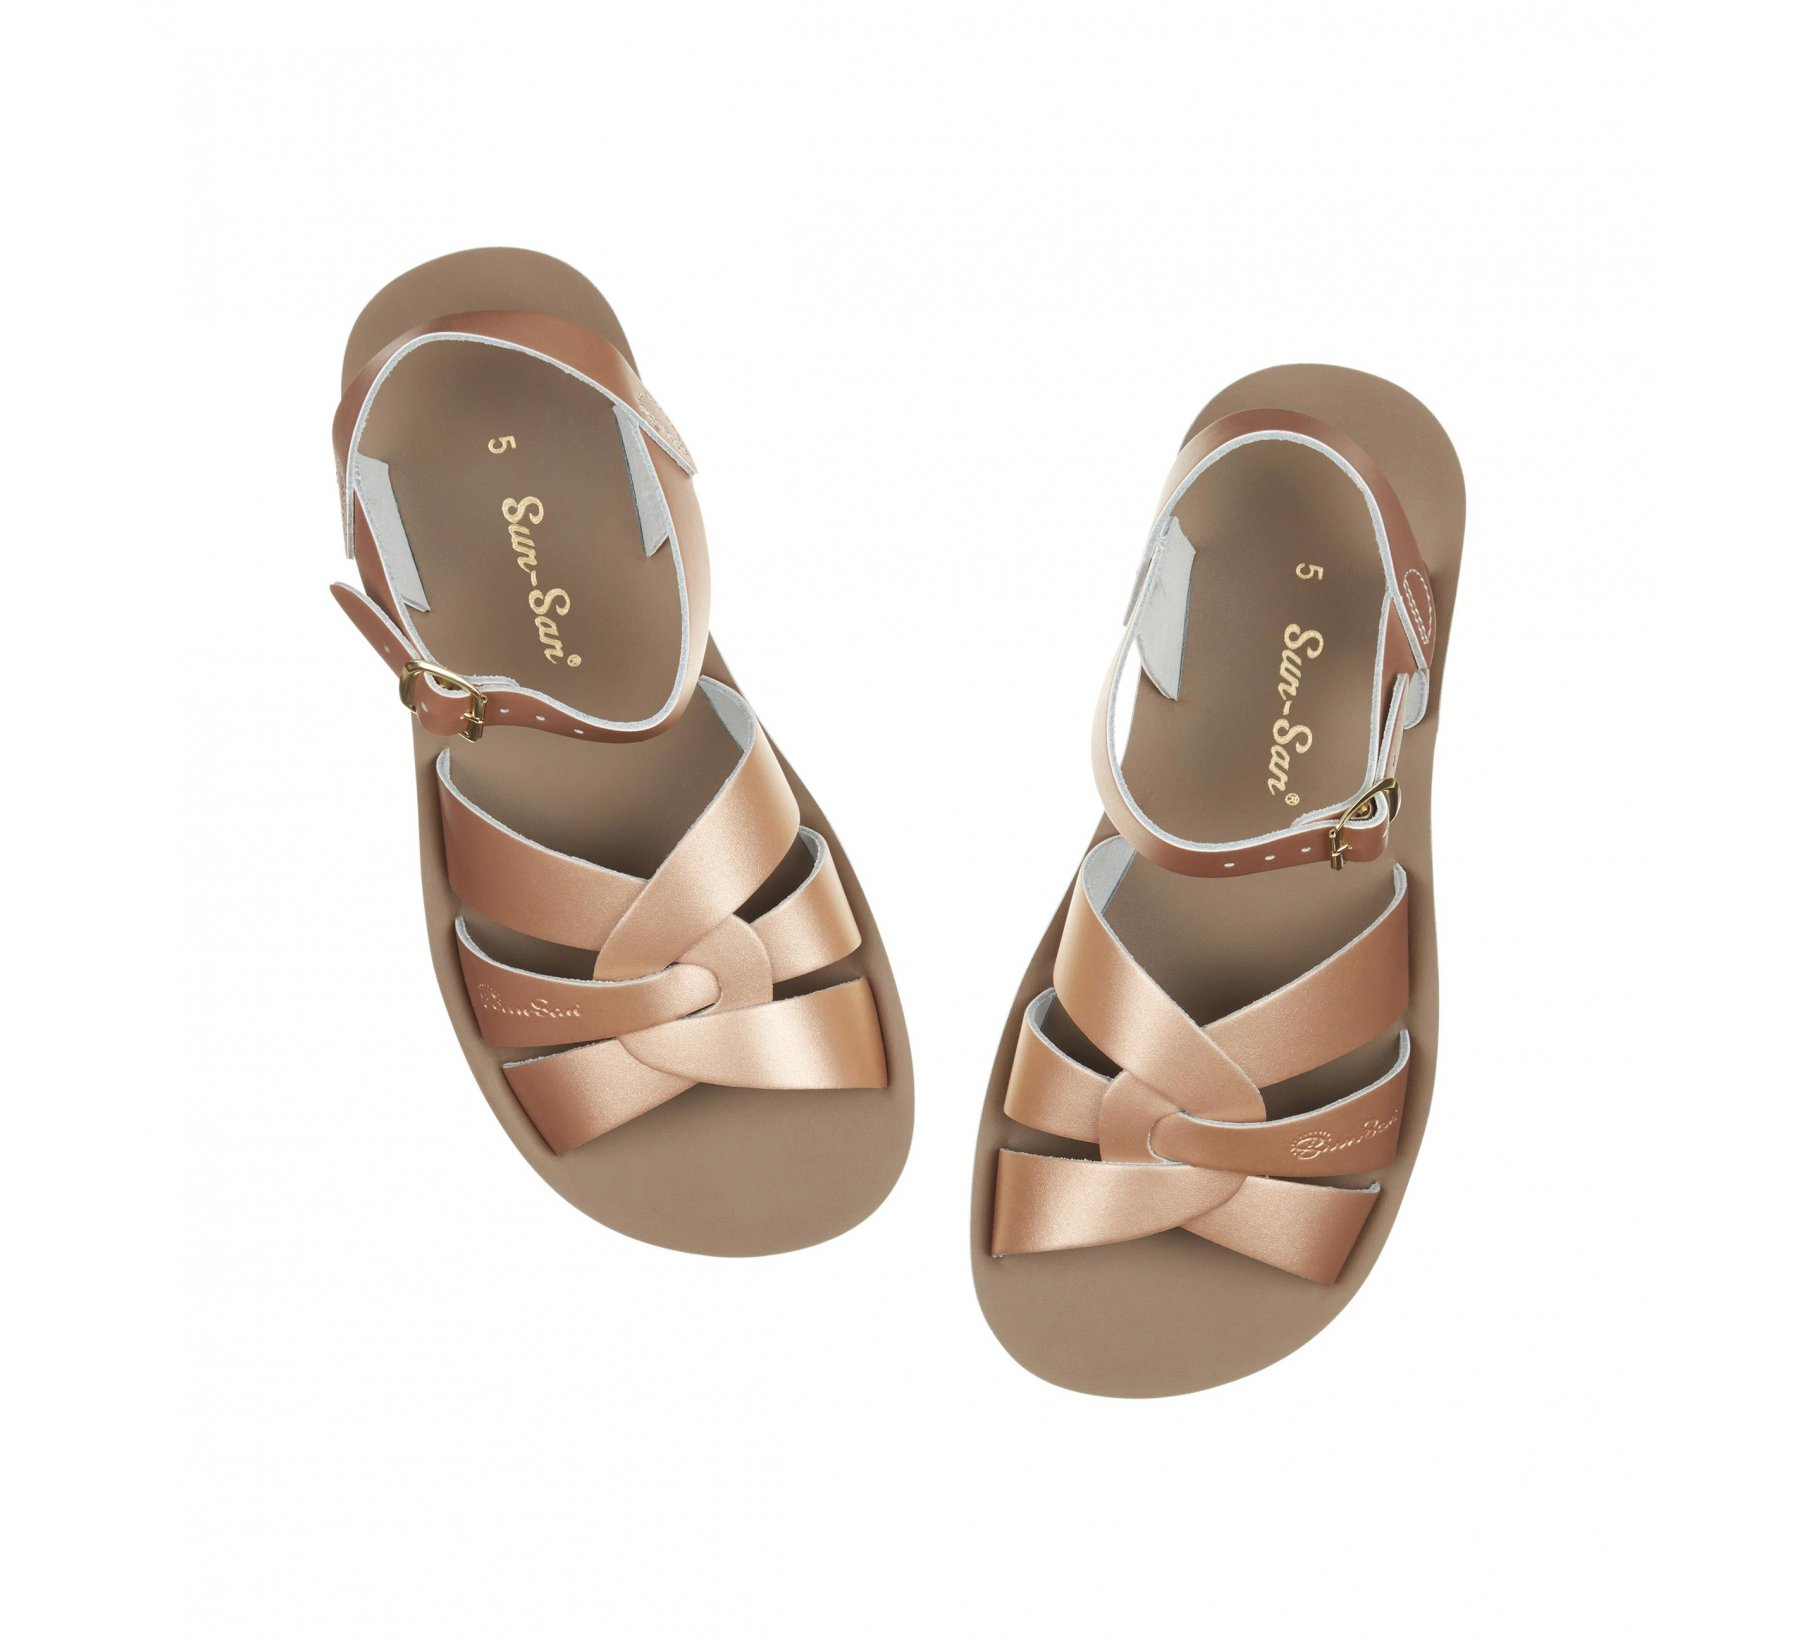 Swimmer Rose Gold - Salt Water Sandals